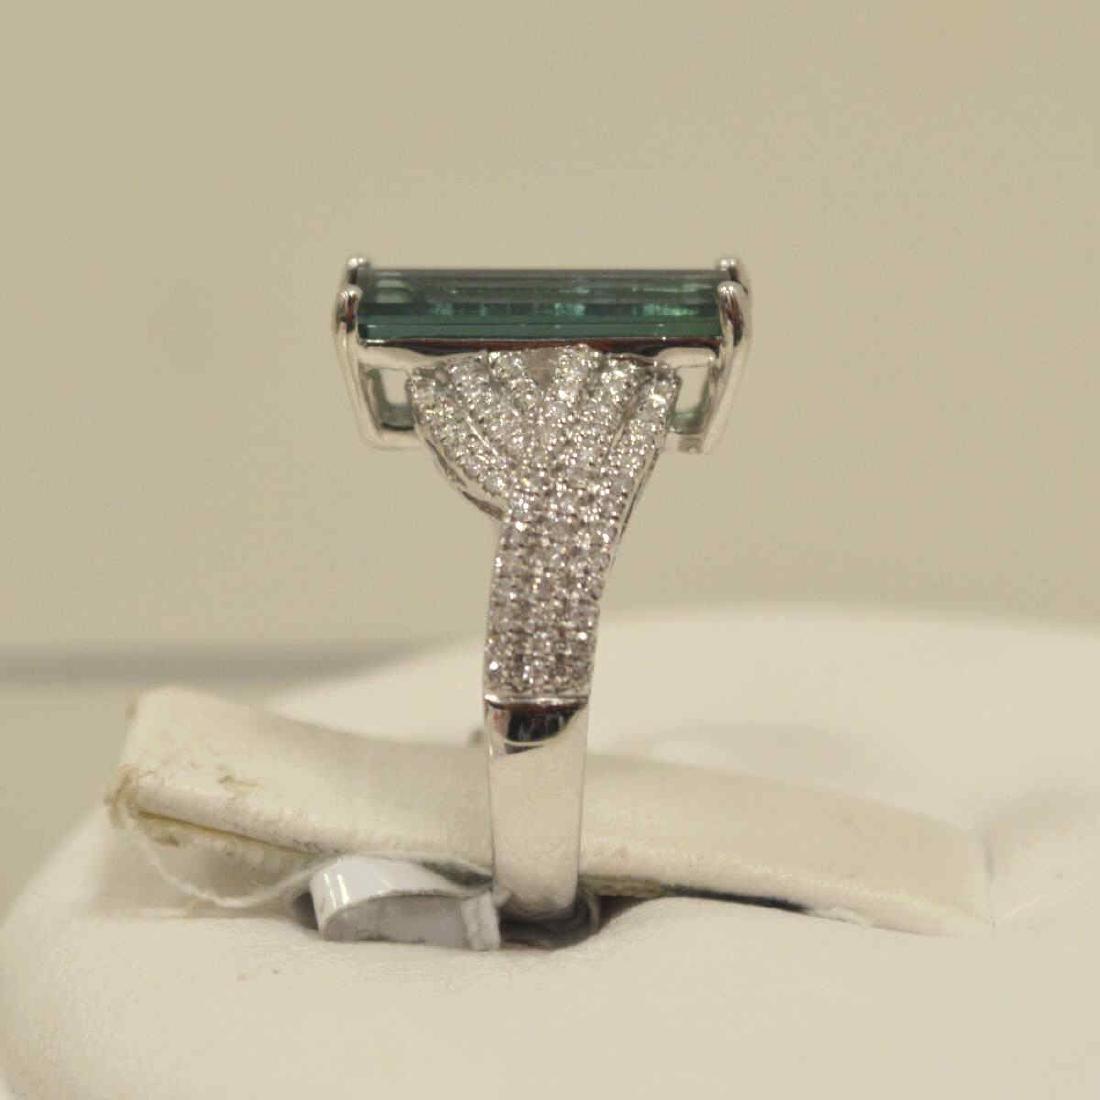 14kt white gold tourmaline and diamond ring - 4